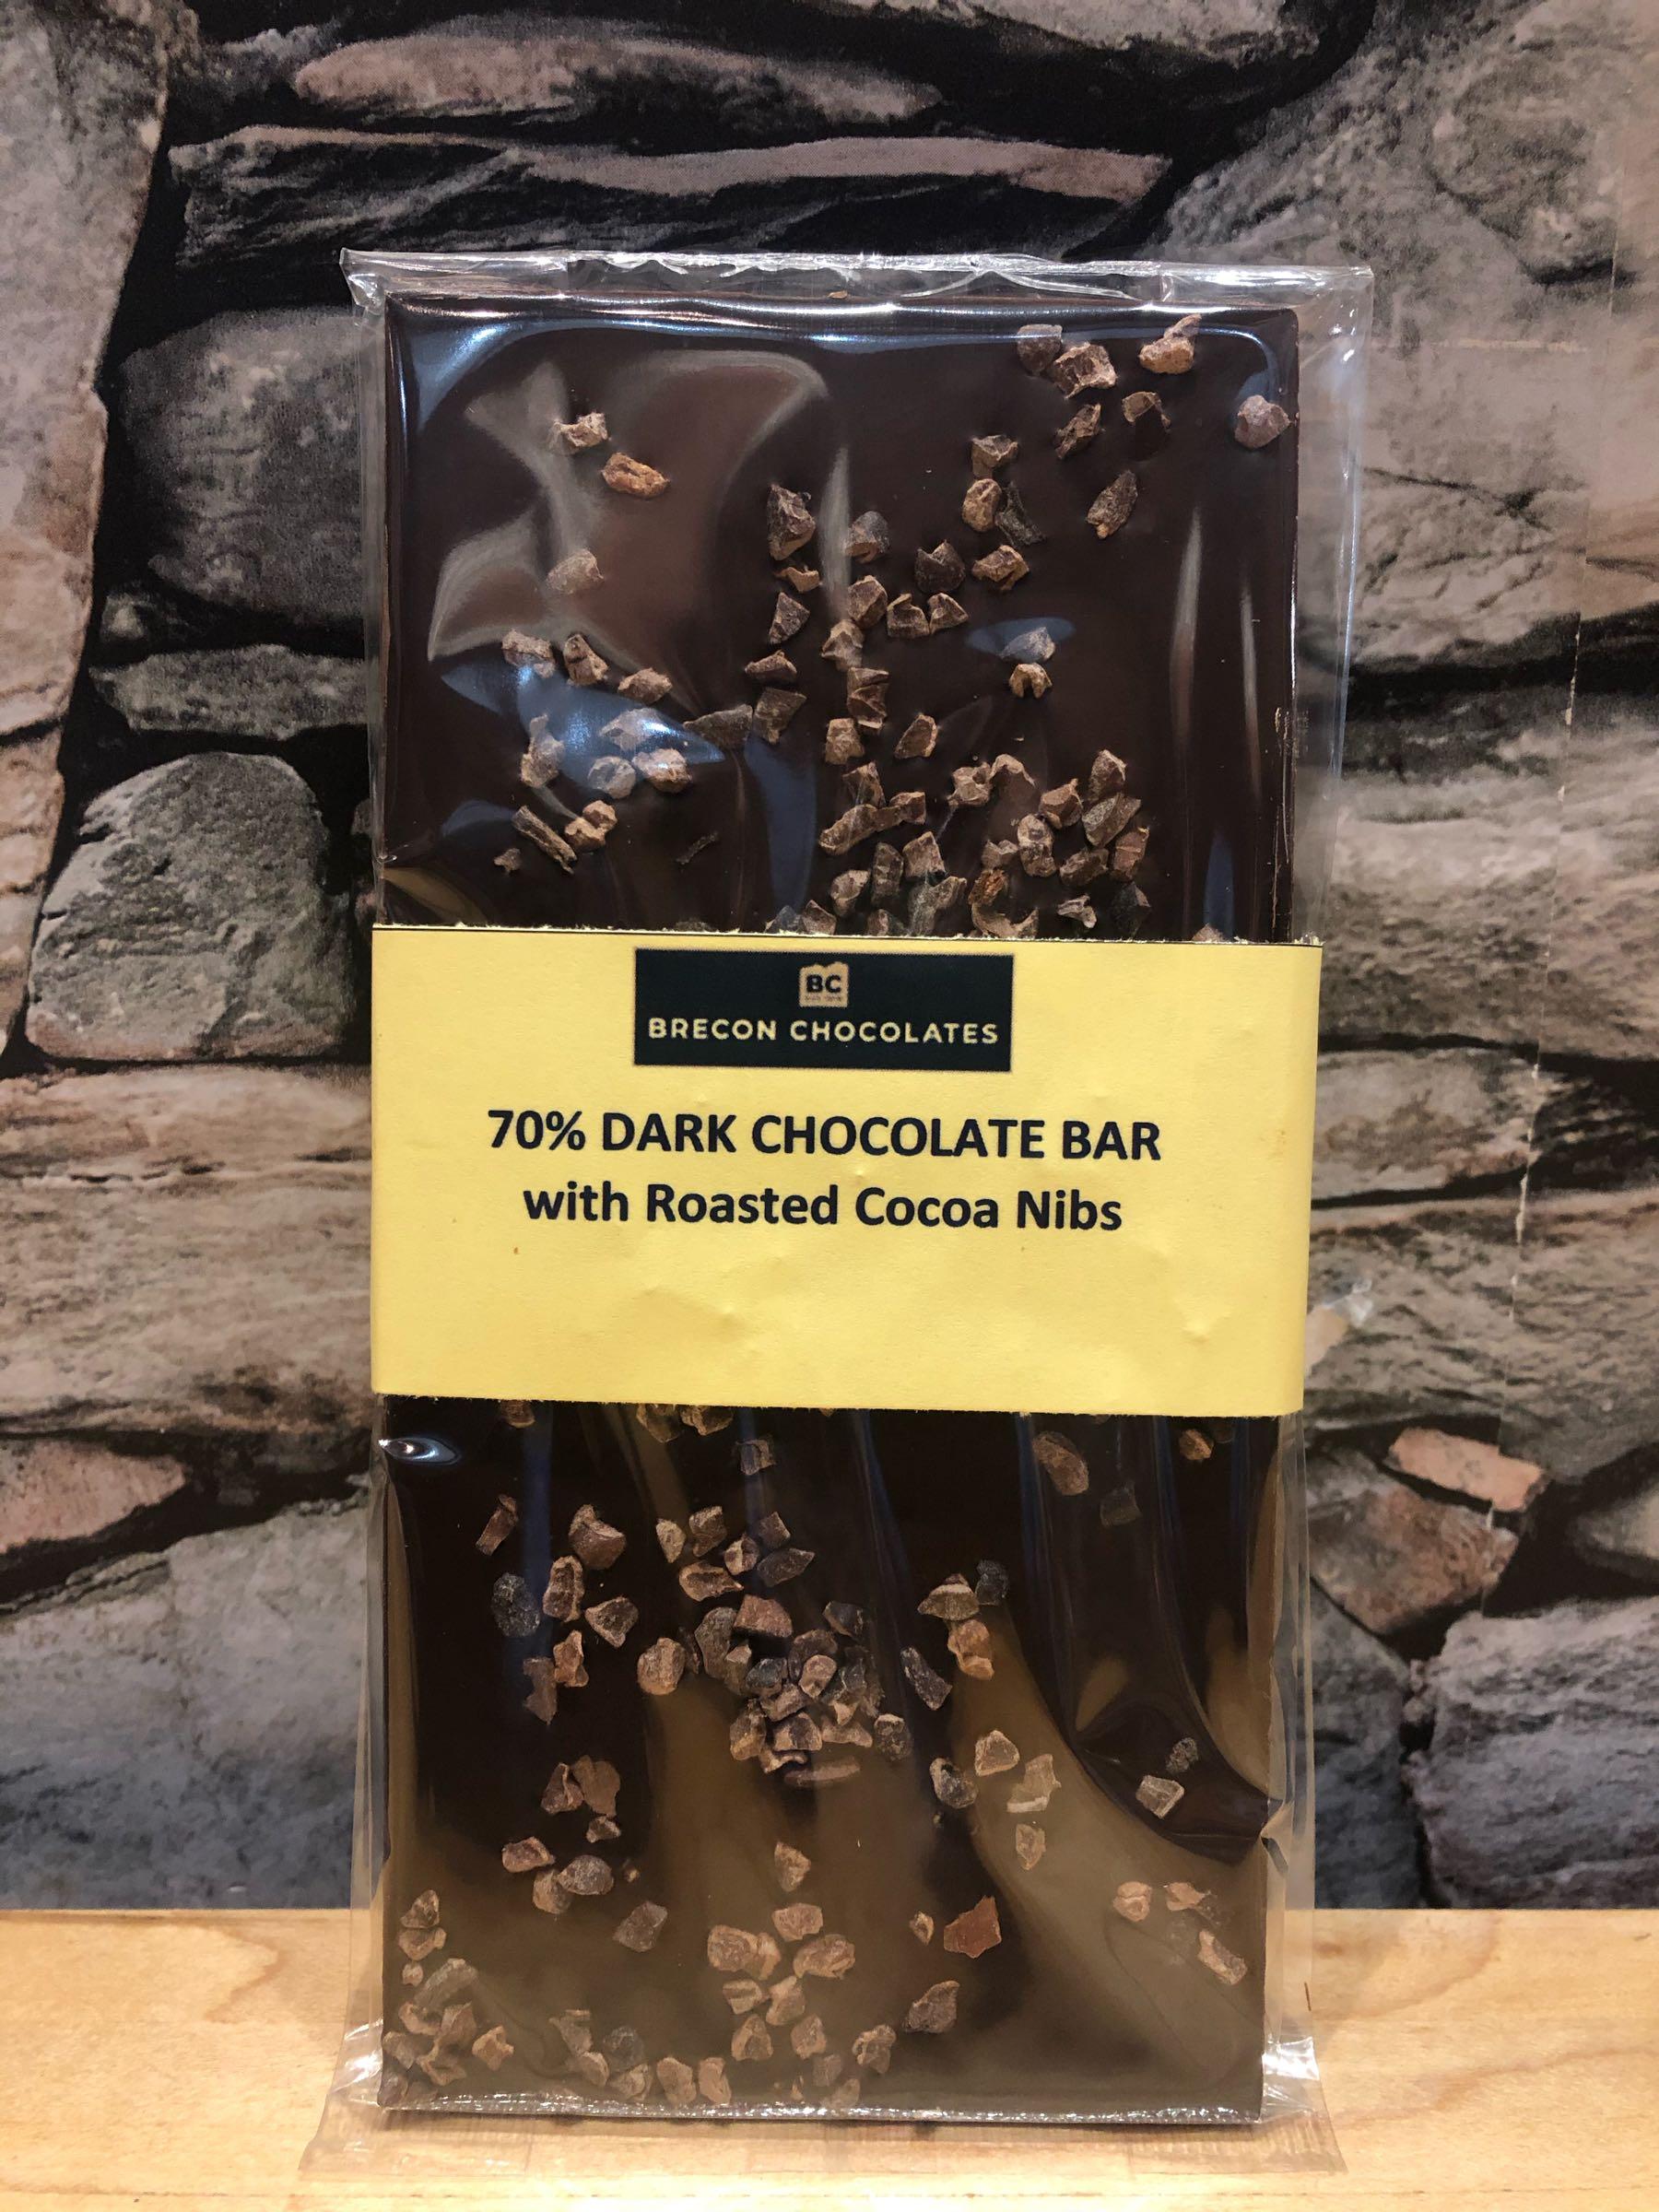 70% Dark Chocolate bar with Cocoa Nib, inclusions.